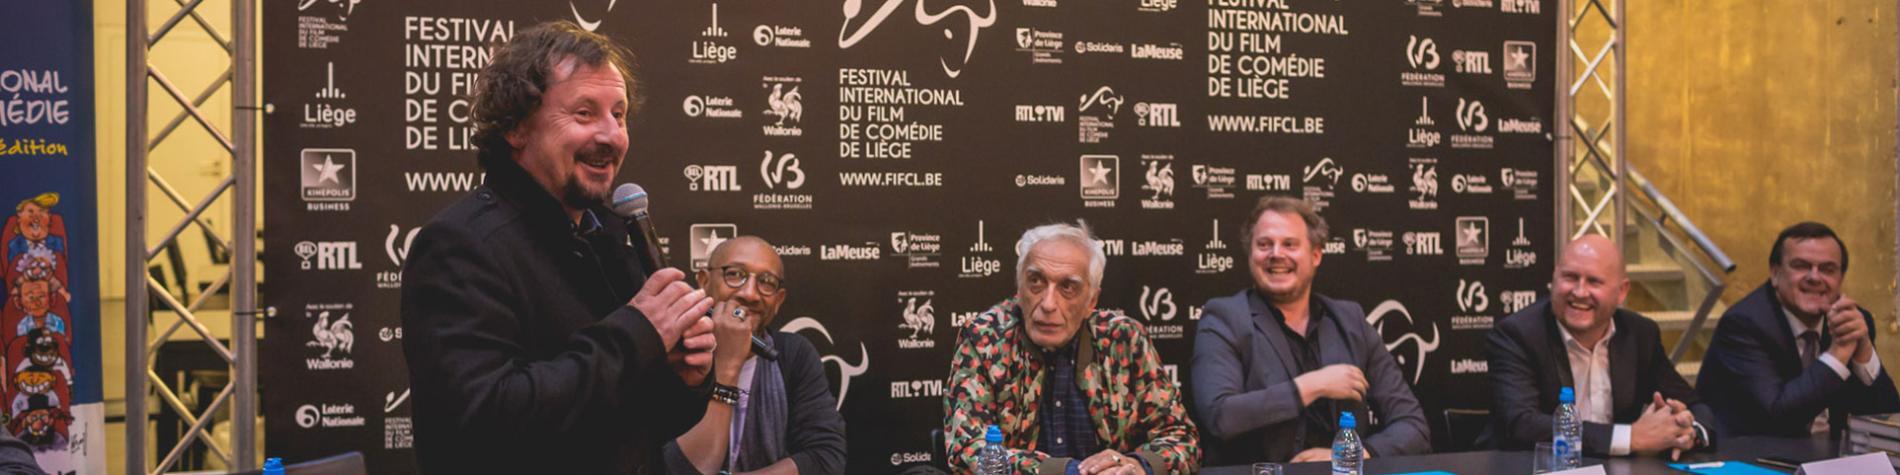 festival - international - film - comédie - Liège